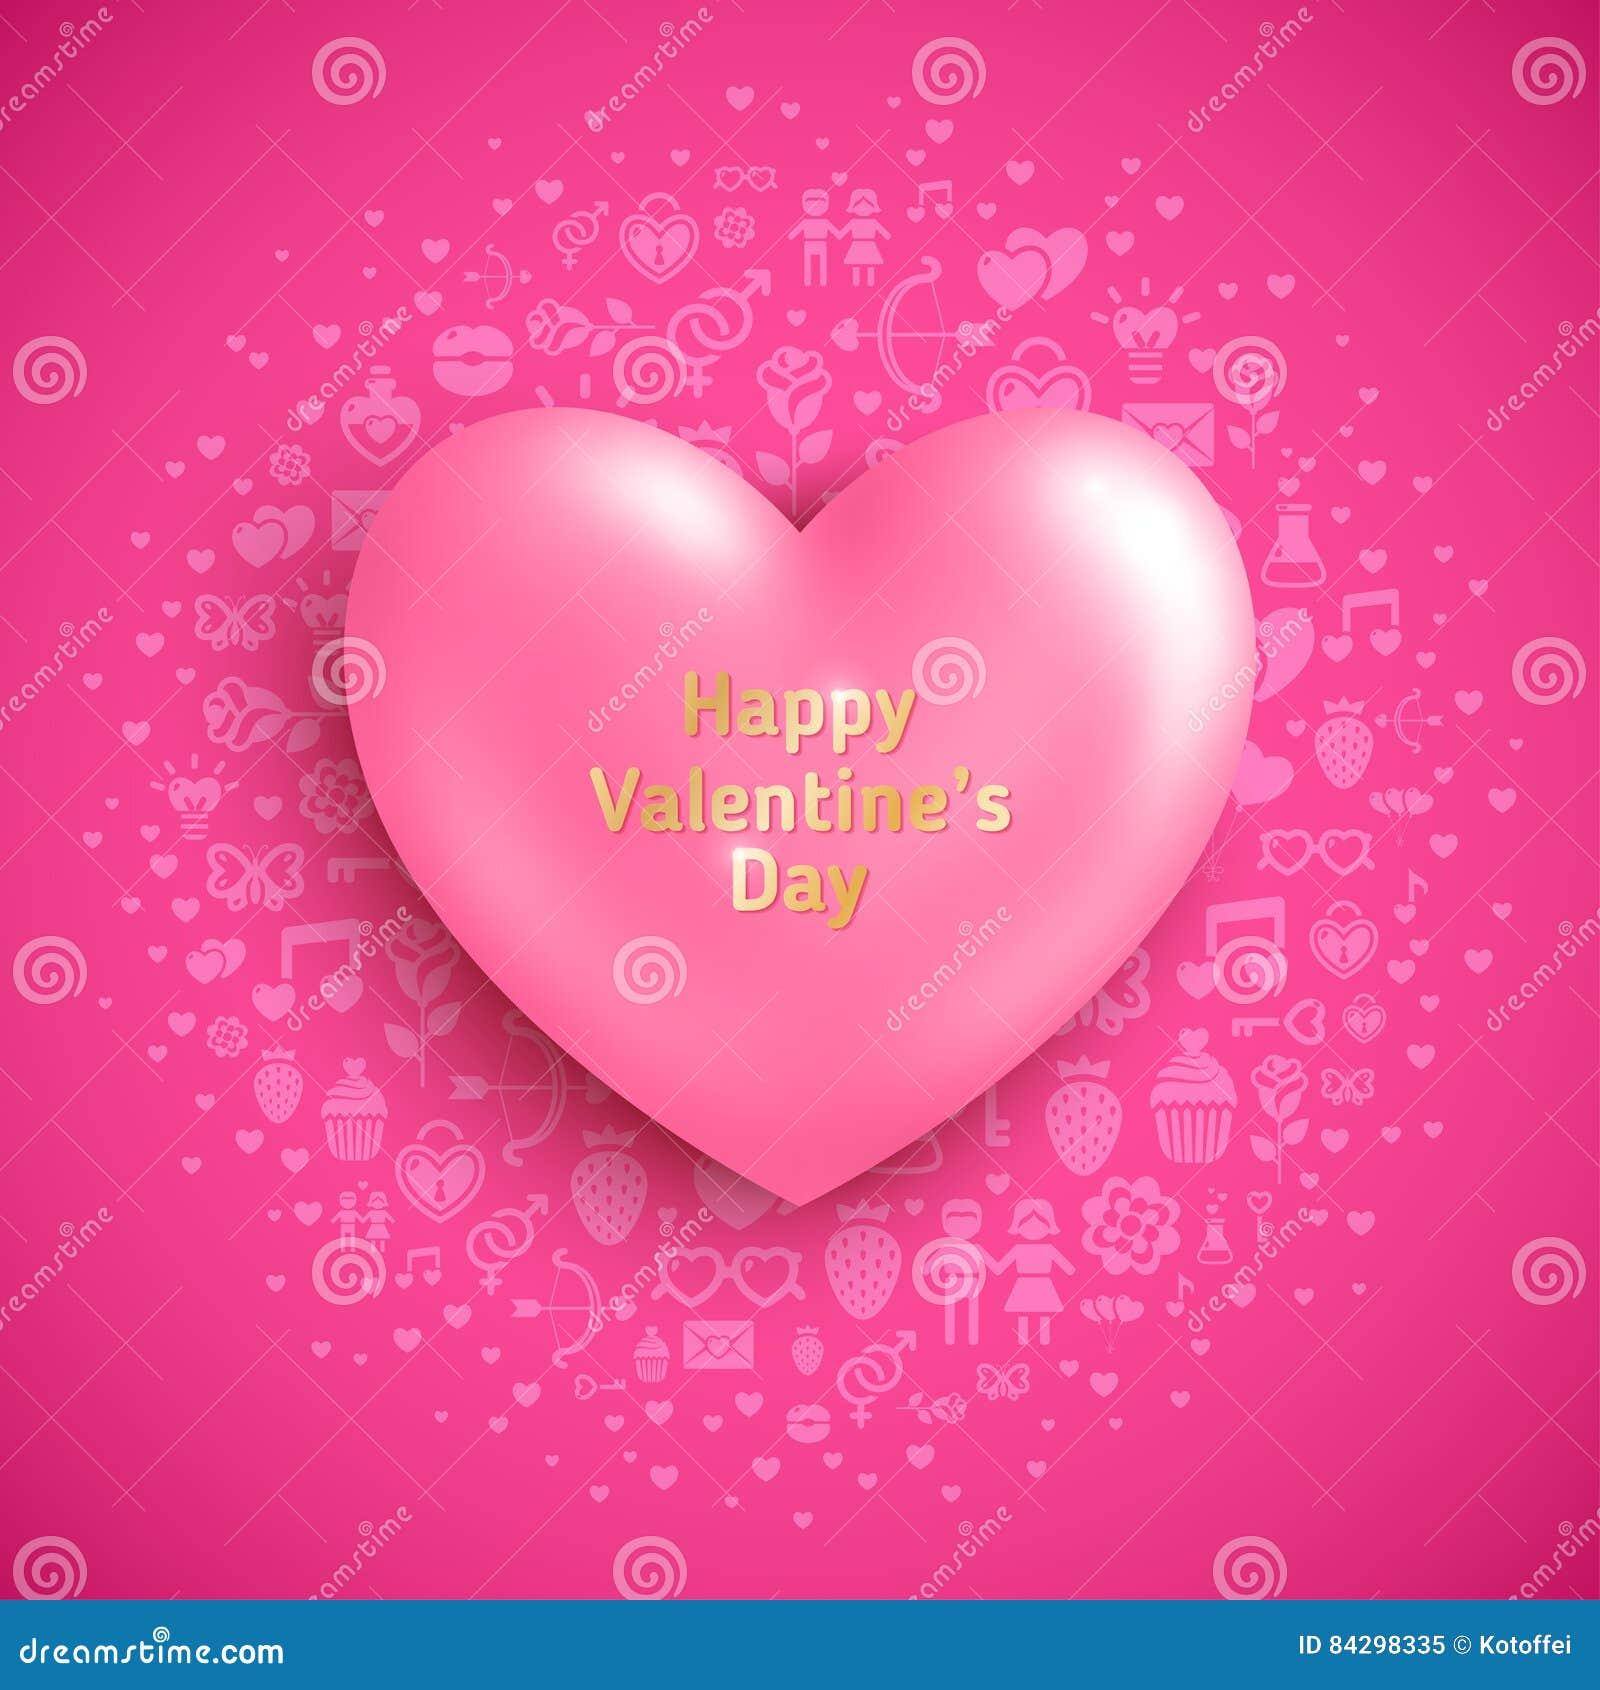 Love heart symbols background stock illustration illustration of pink heart on purple background with love symbols royalty free stock photo buycottarizona Gallery